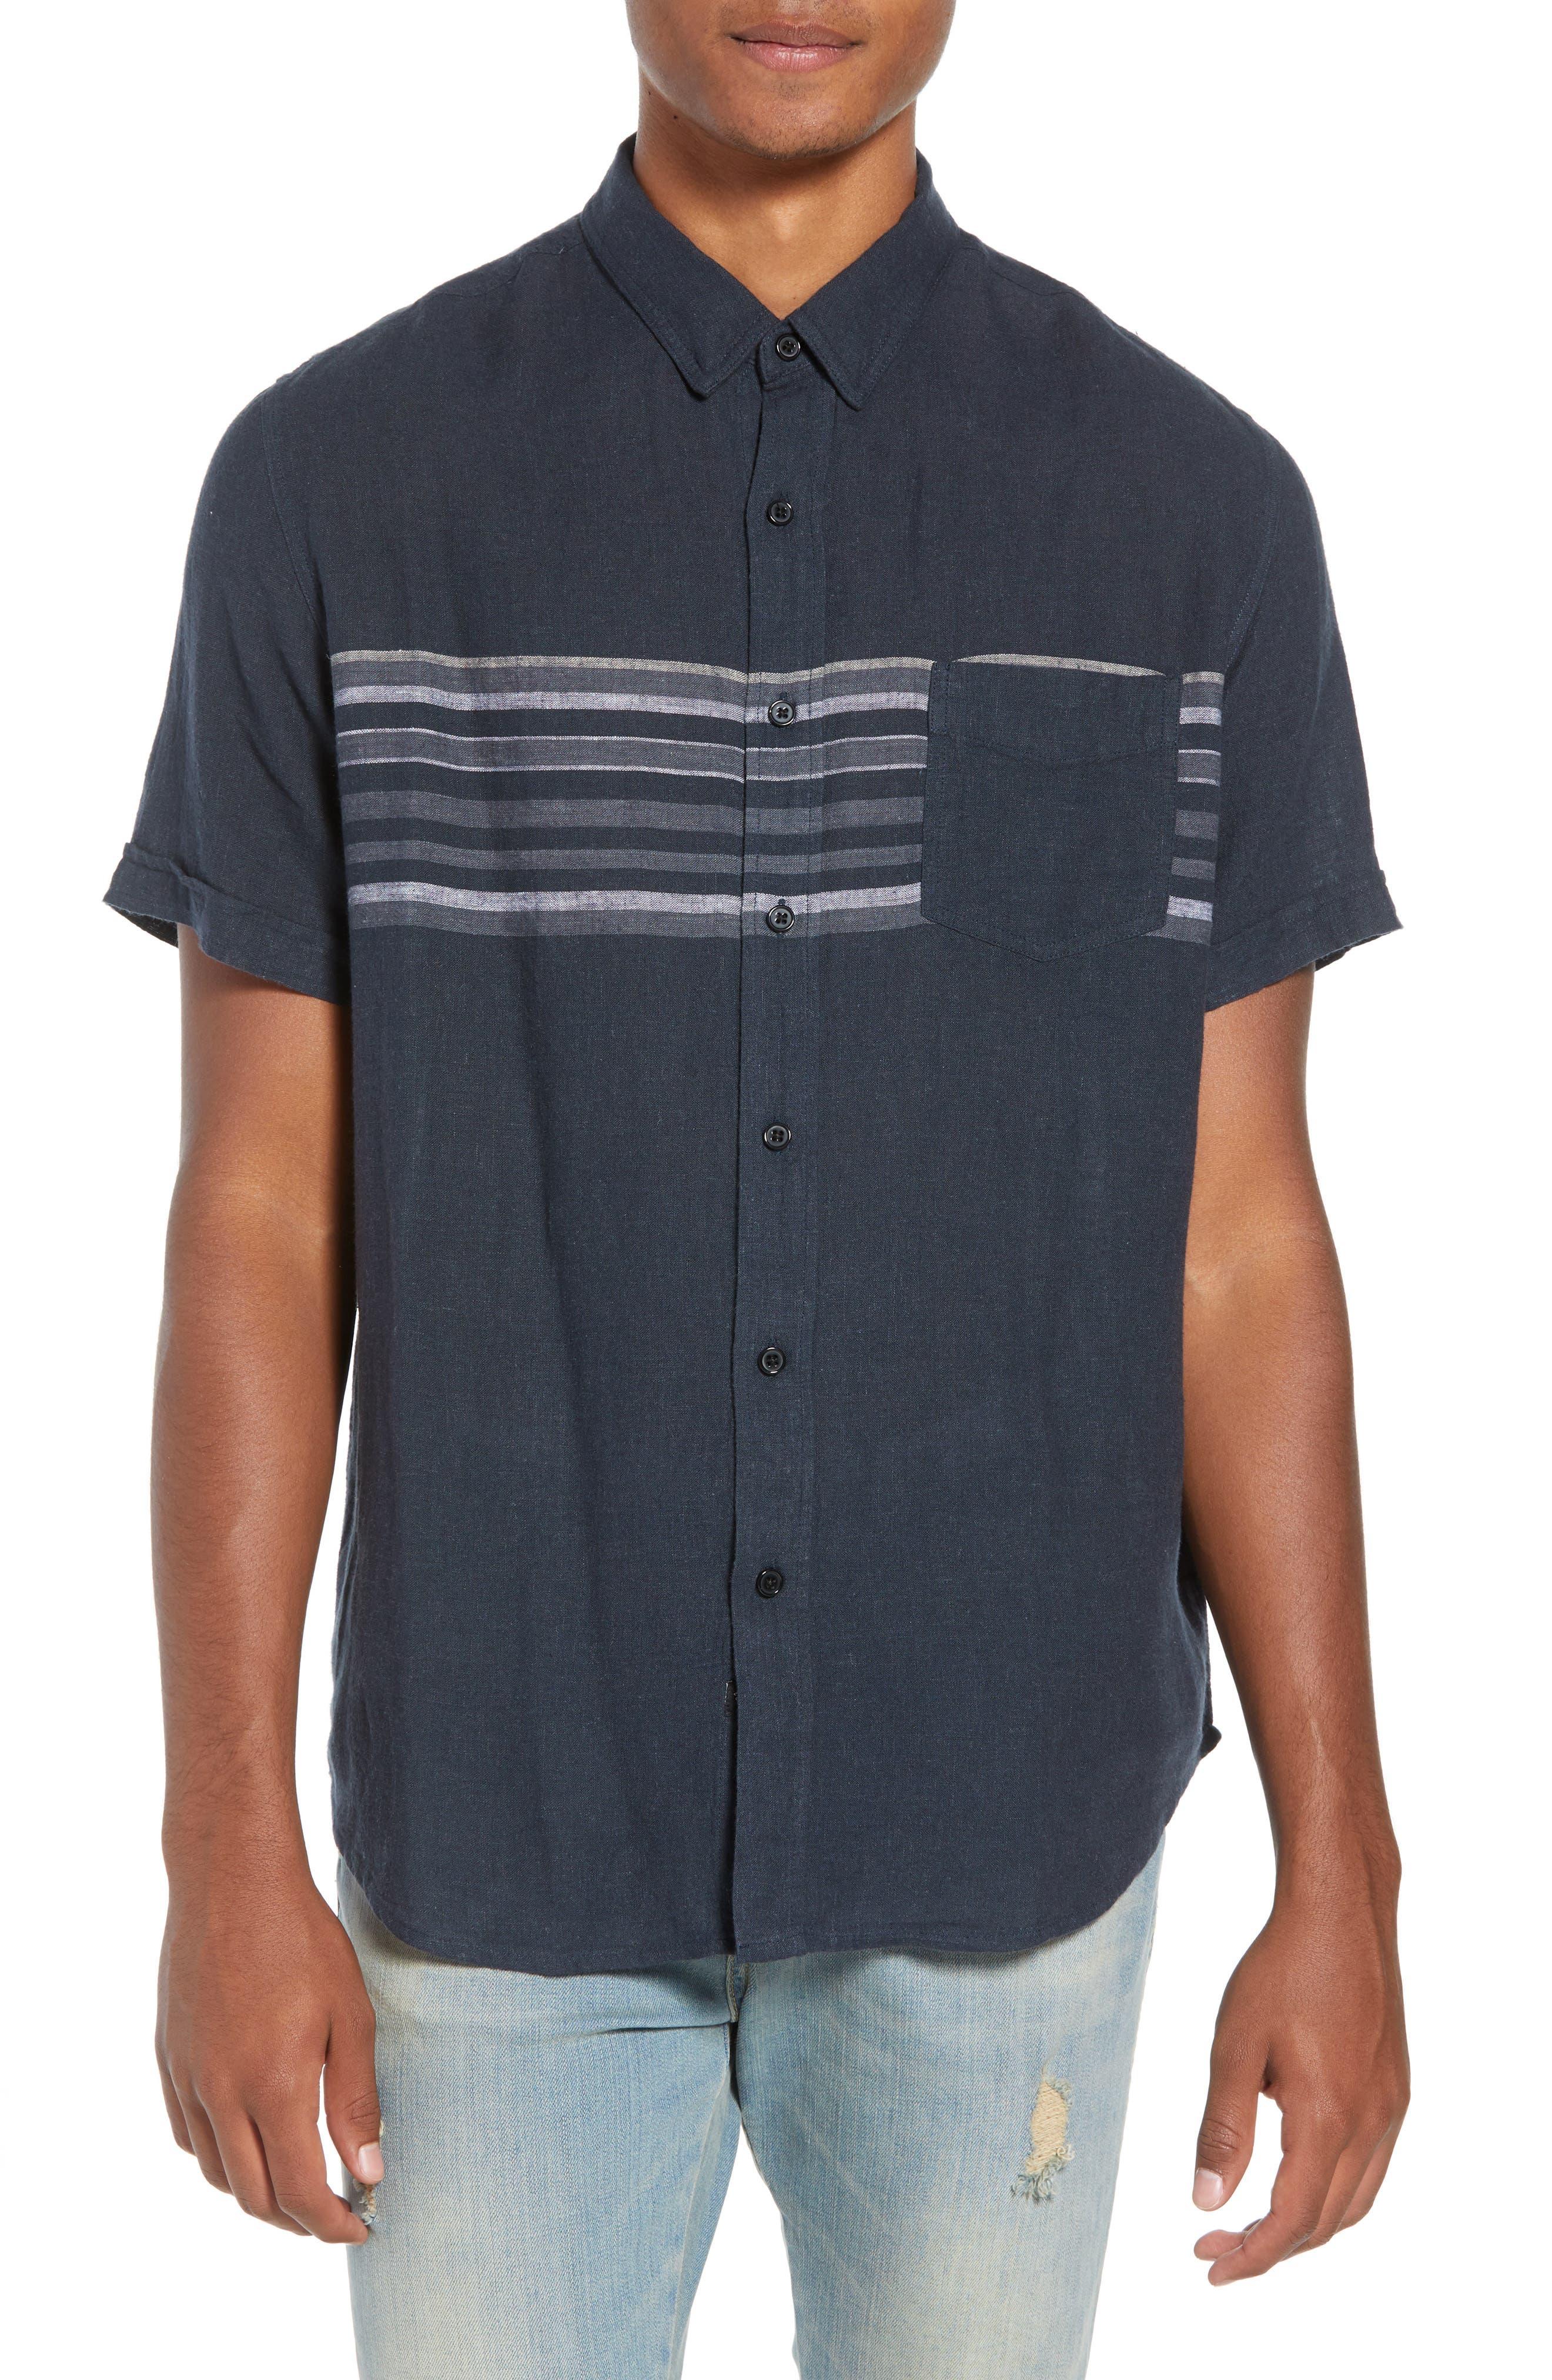 Carson Regular Fit Stripe Woven Shirt,                         Main,                         color, NAVY/WHITE/GREY STRIPE